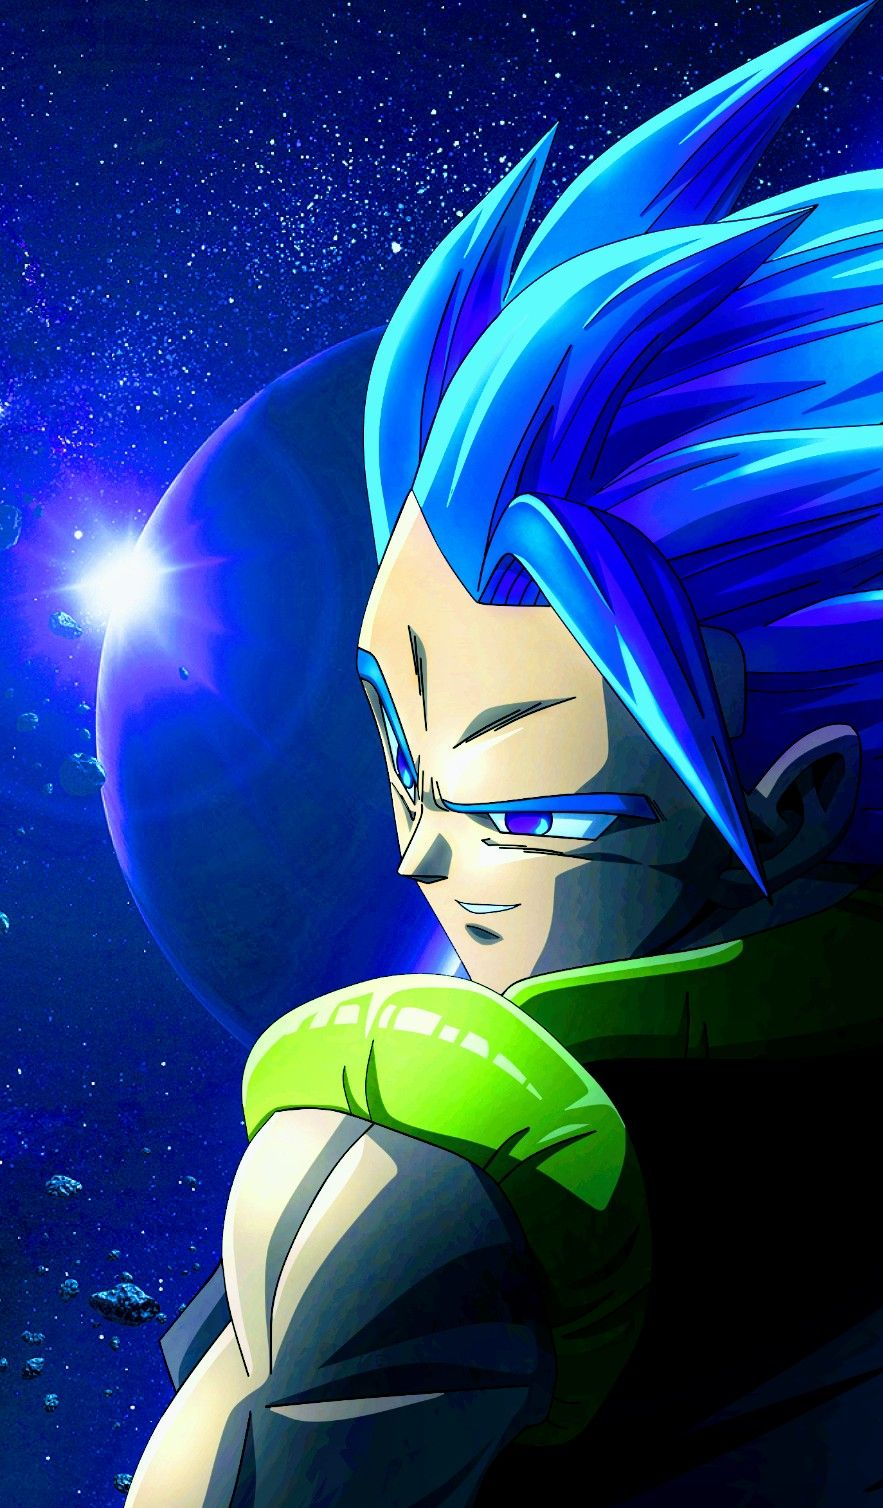 Gogeta Super Saiyan Blue Dragon Ball Super Dragon Ball Image Dragon Ball Dragon Ball Super